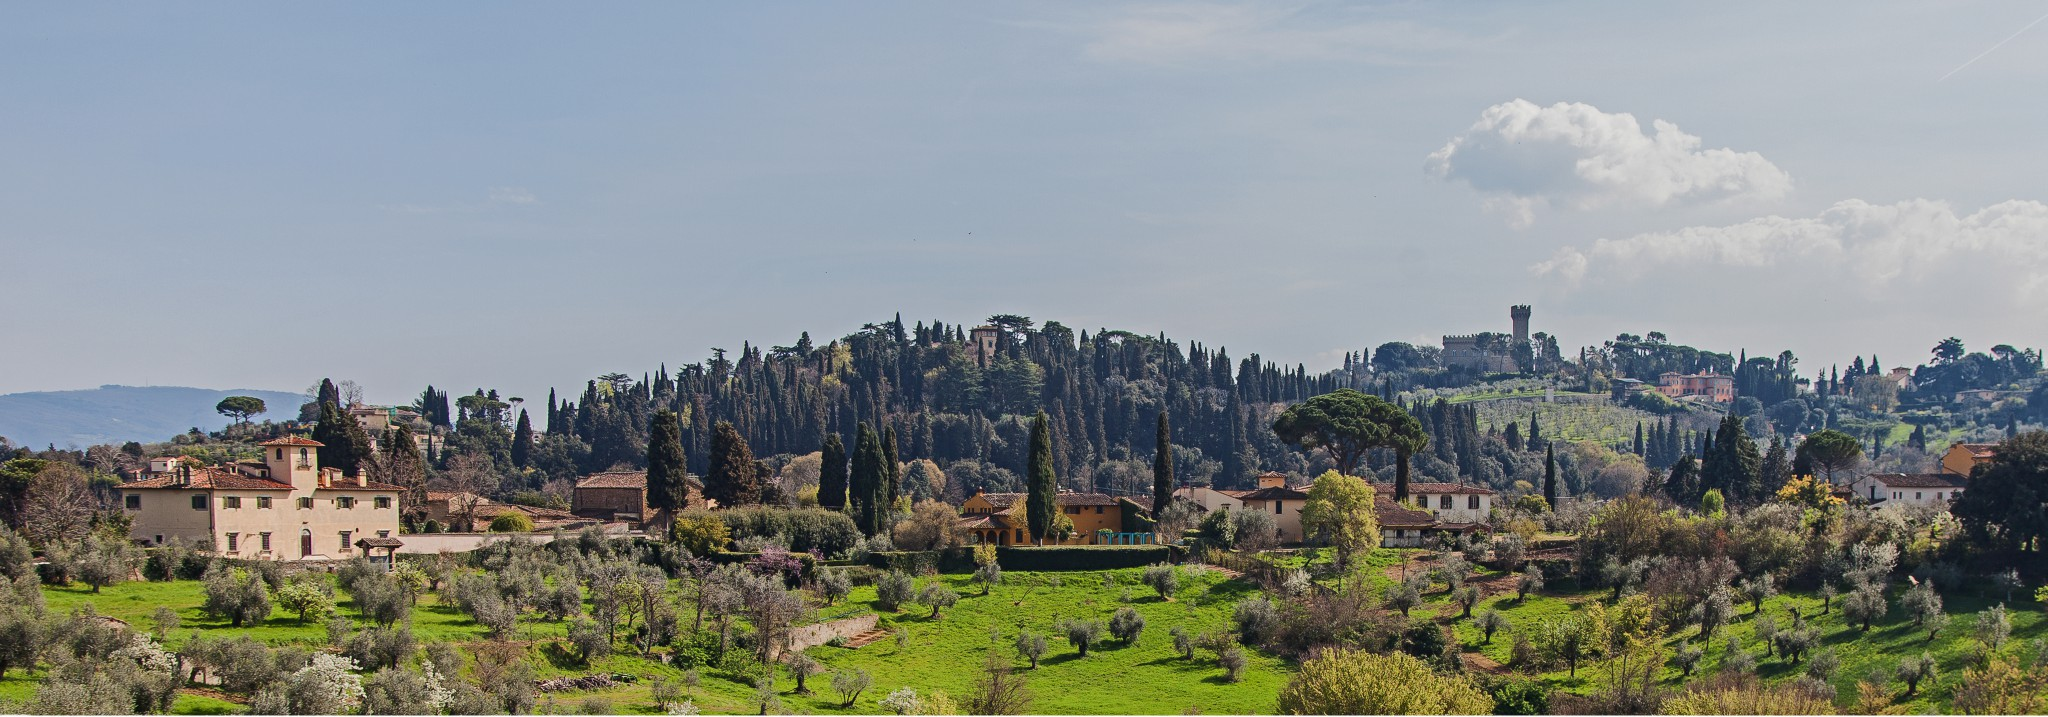 Blick von Fort di Belvedere